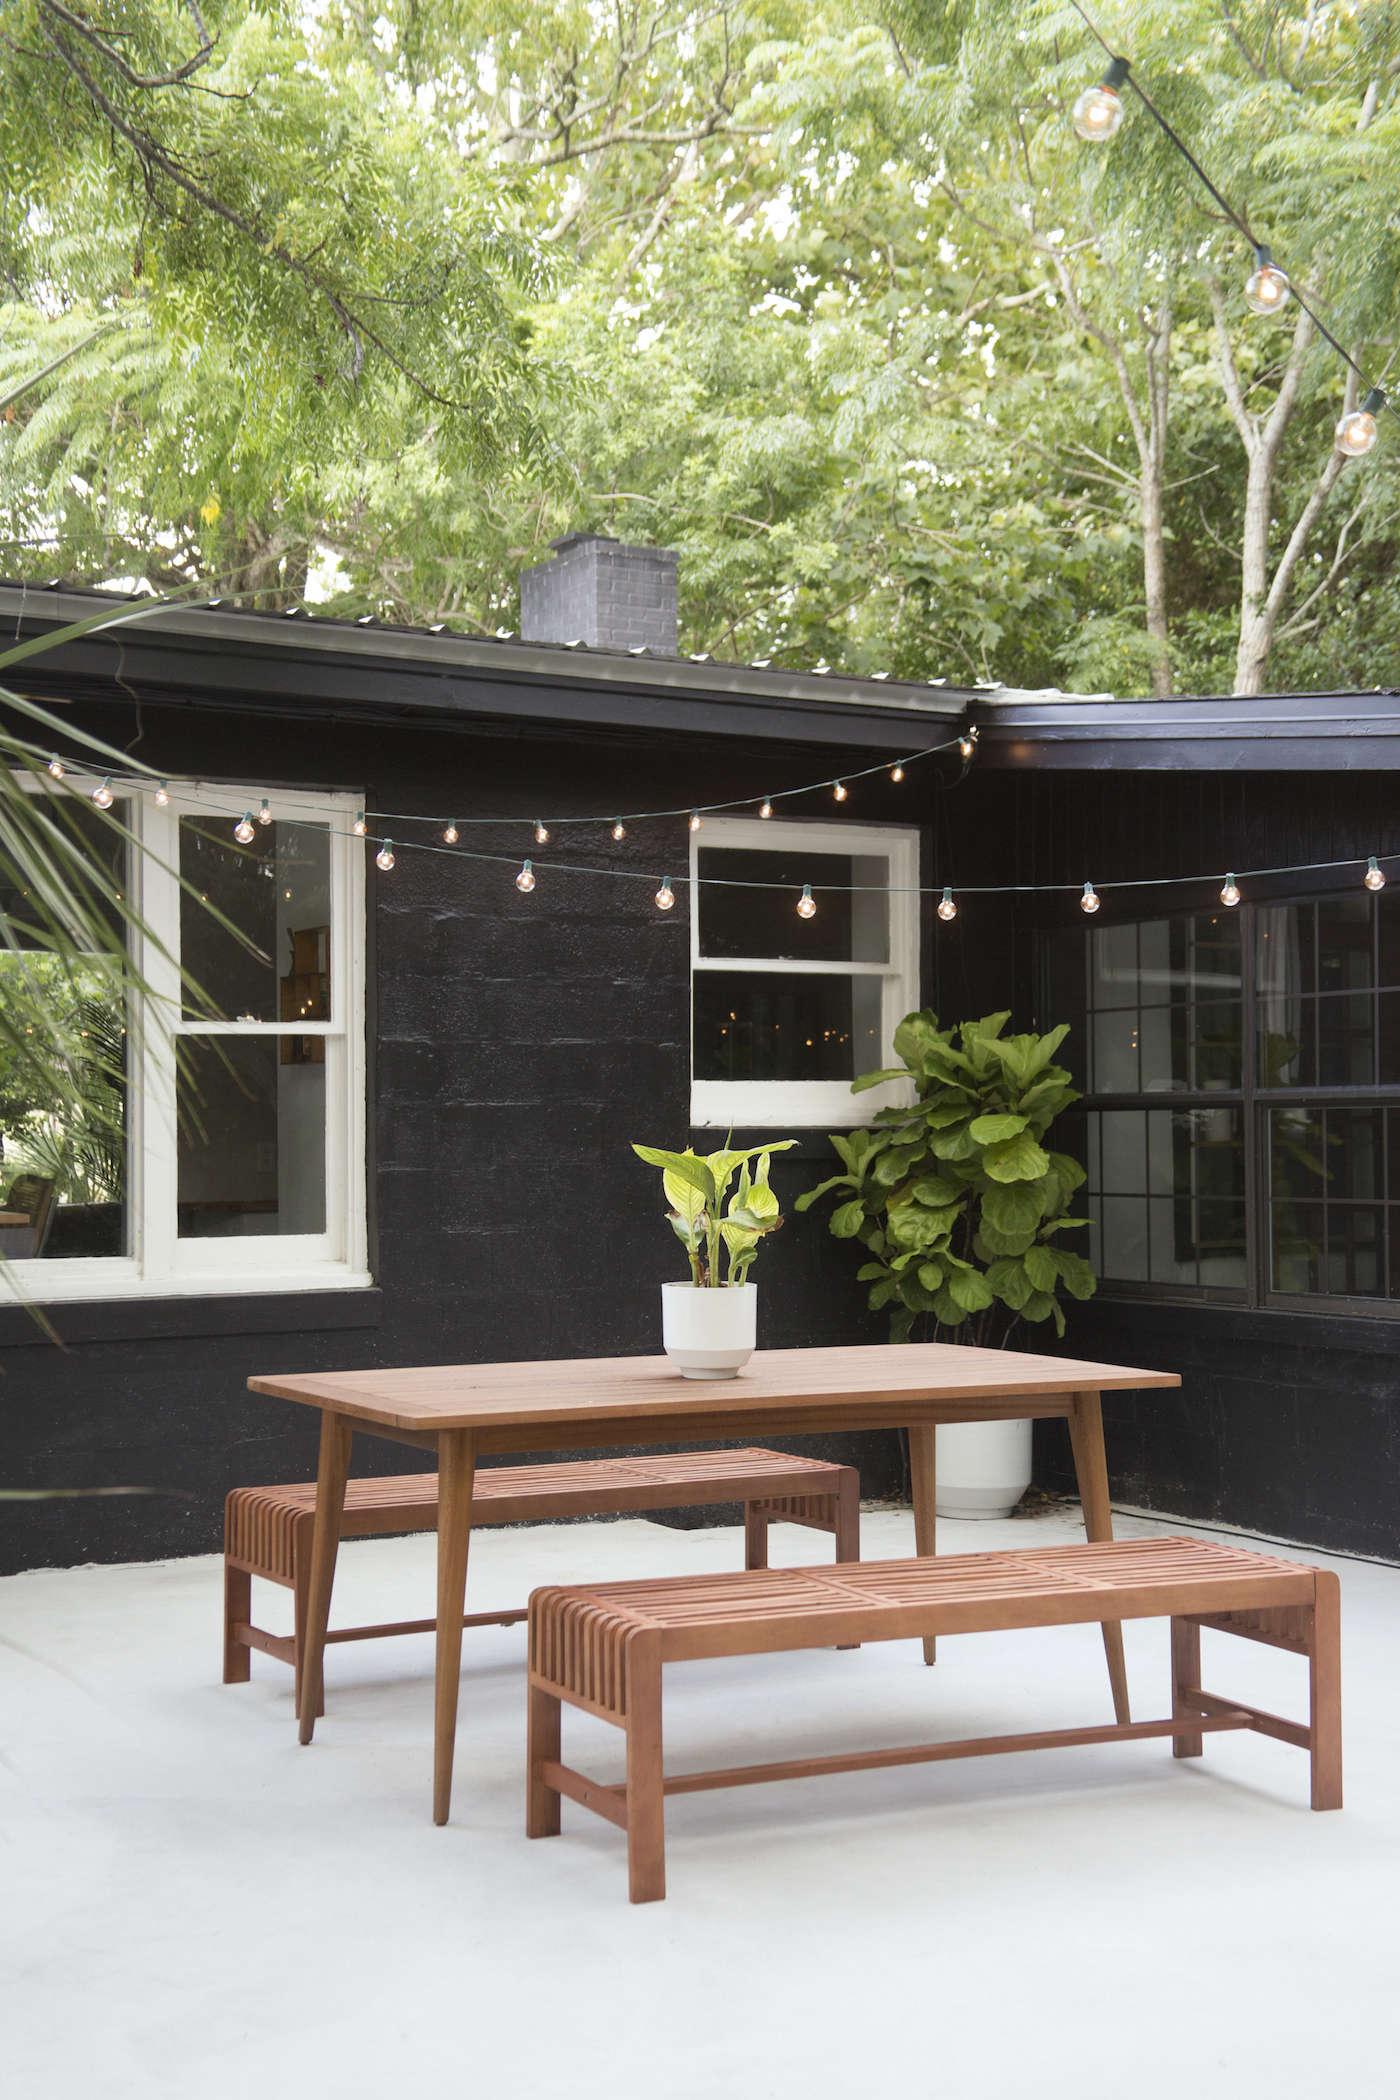 Fullsize Of Photos Of Backyards Landscaping Ideas